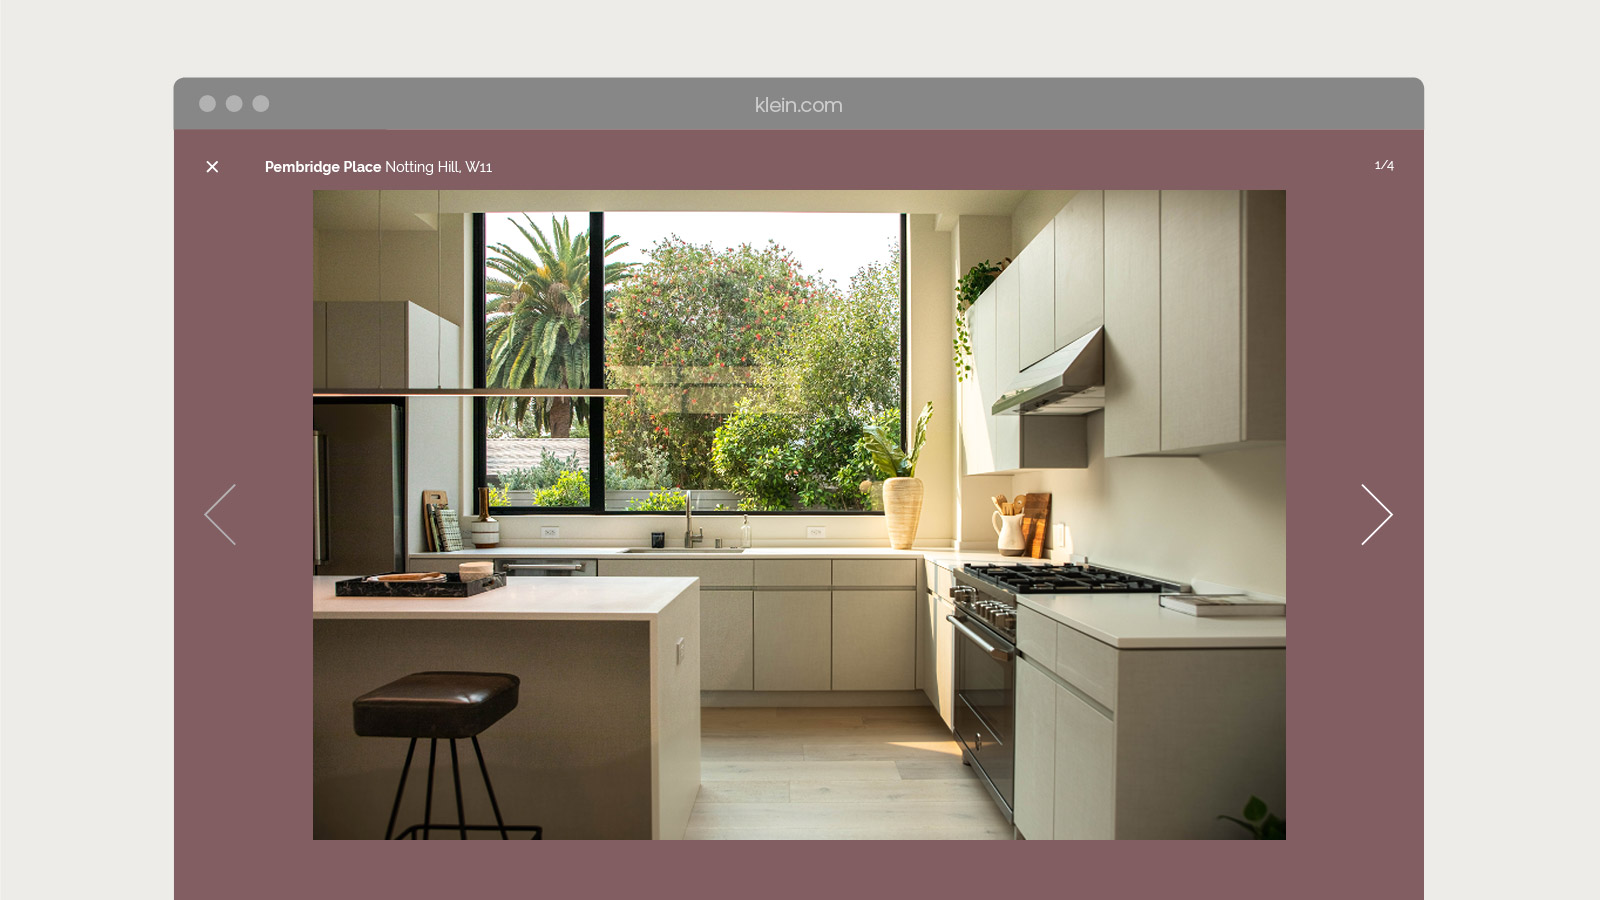 property-agency-visual-branding-identity-design-milton-keynes-london-16